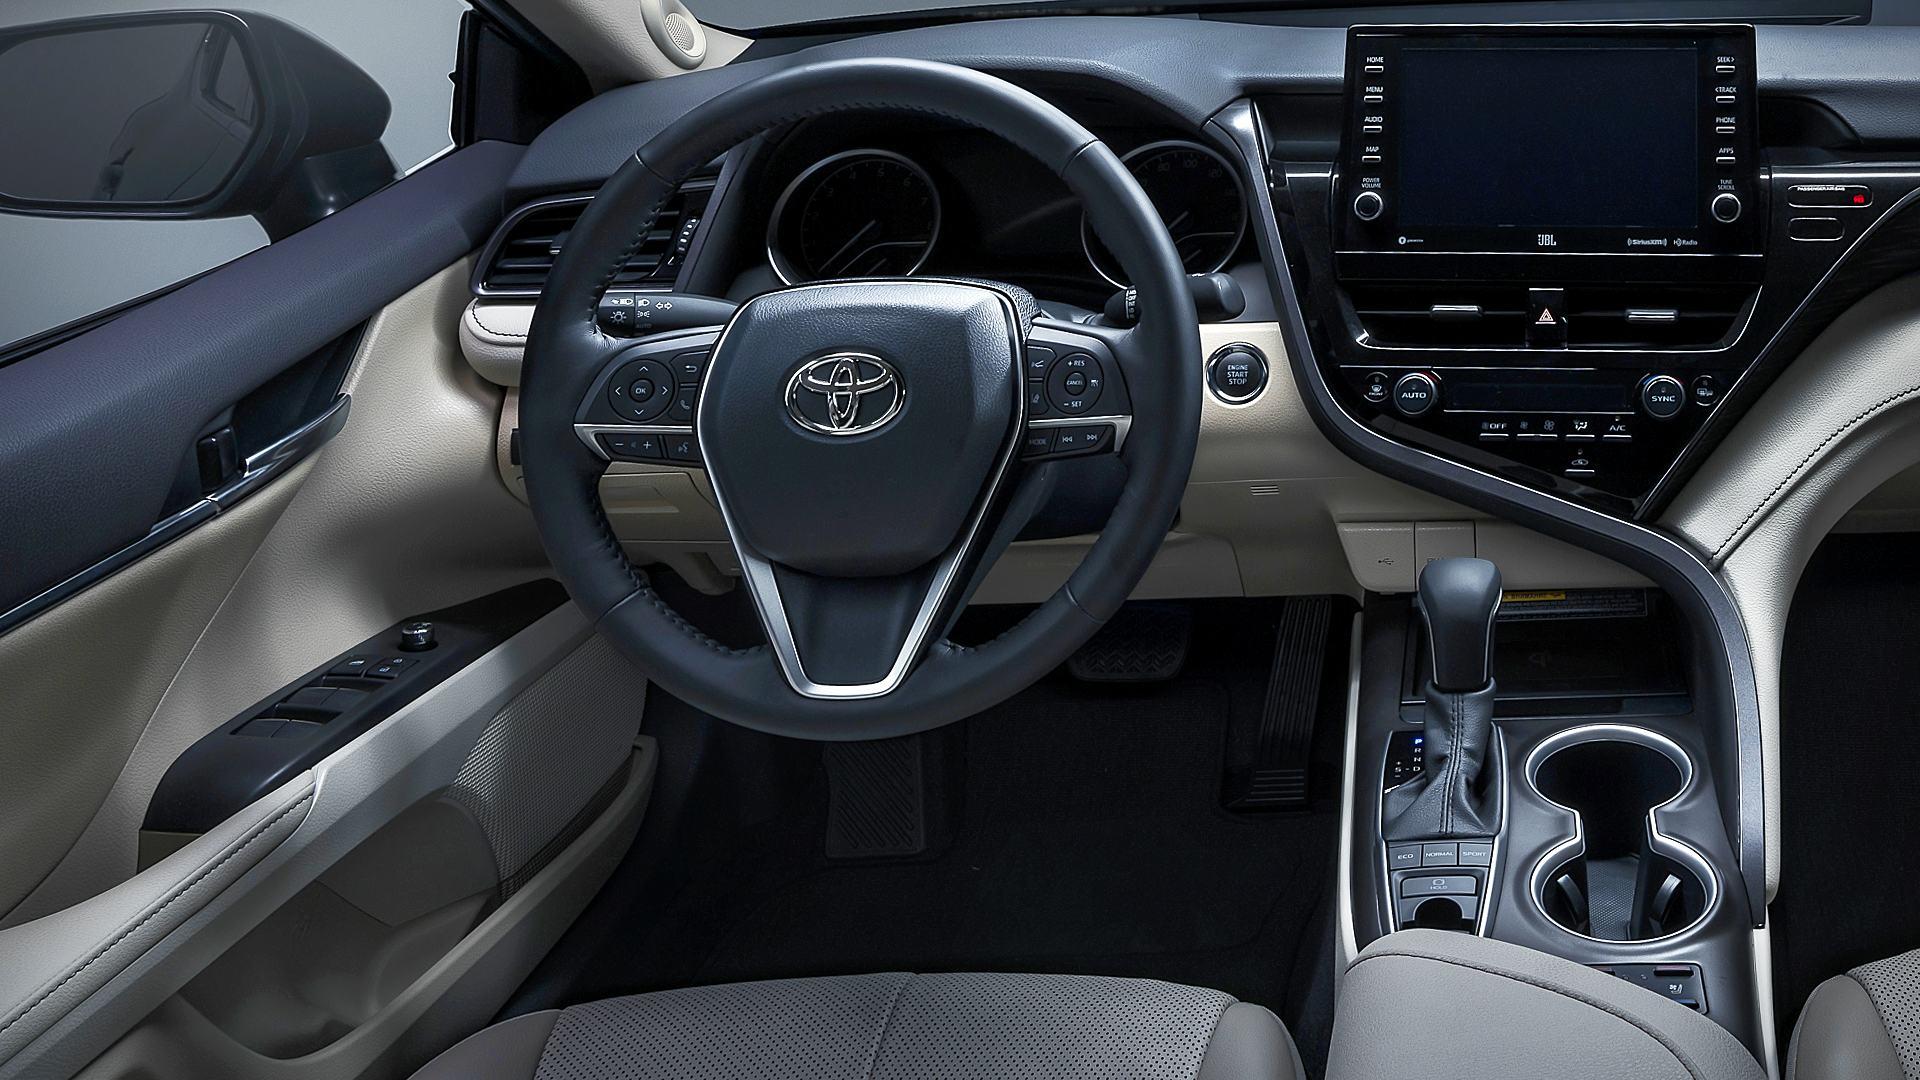 2021 Toyota Camry Interior Inside